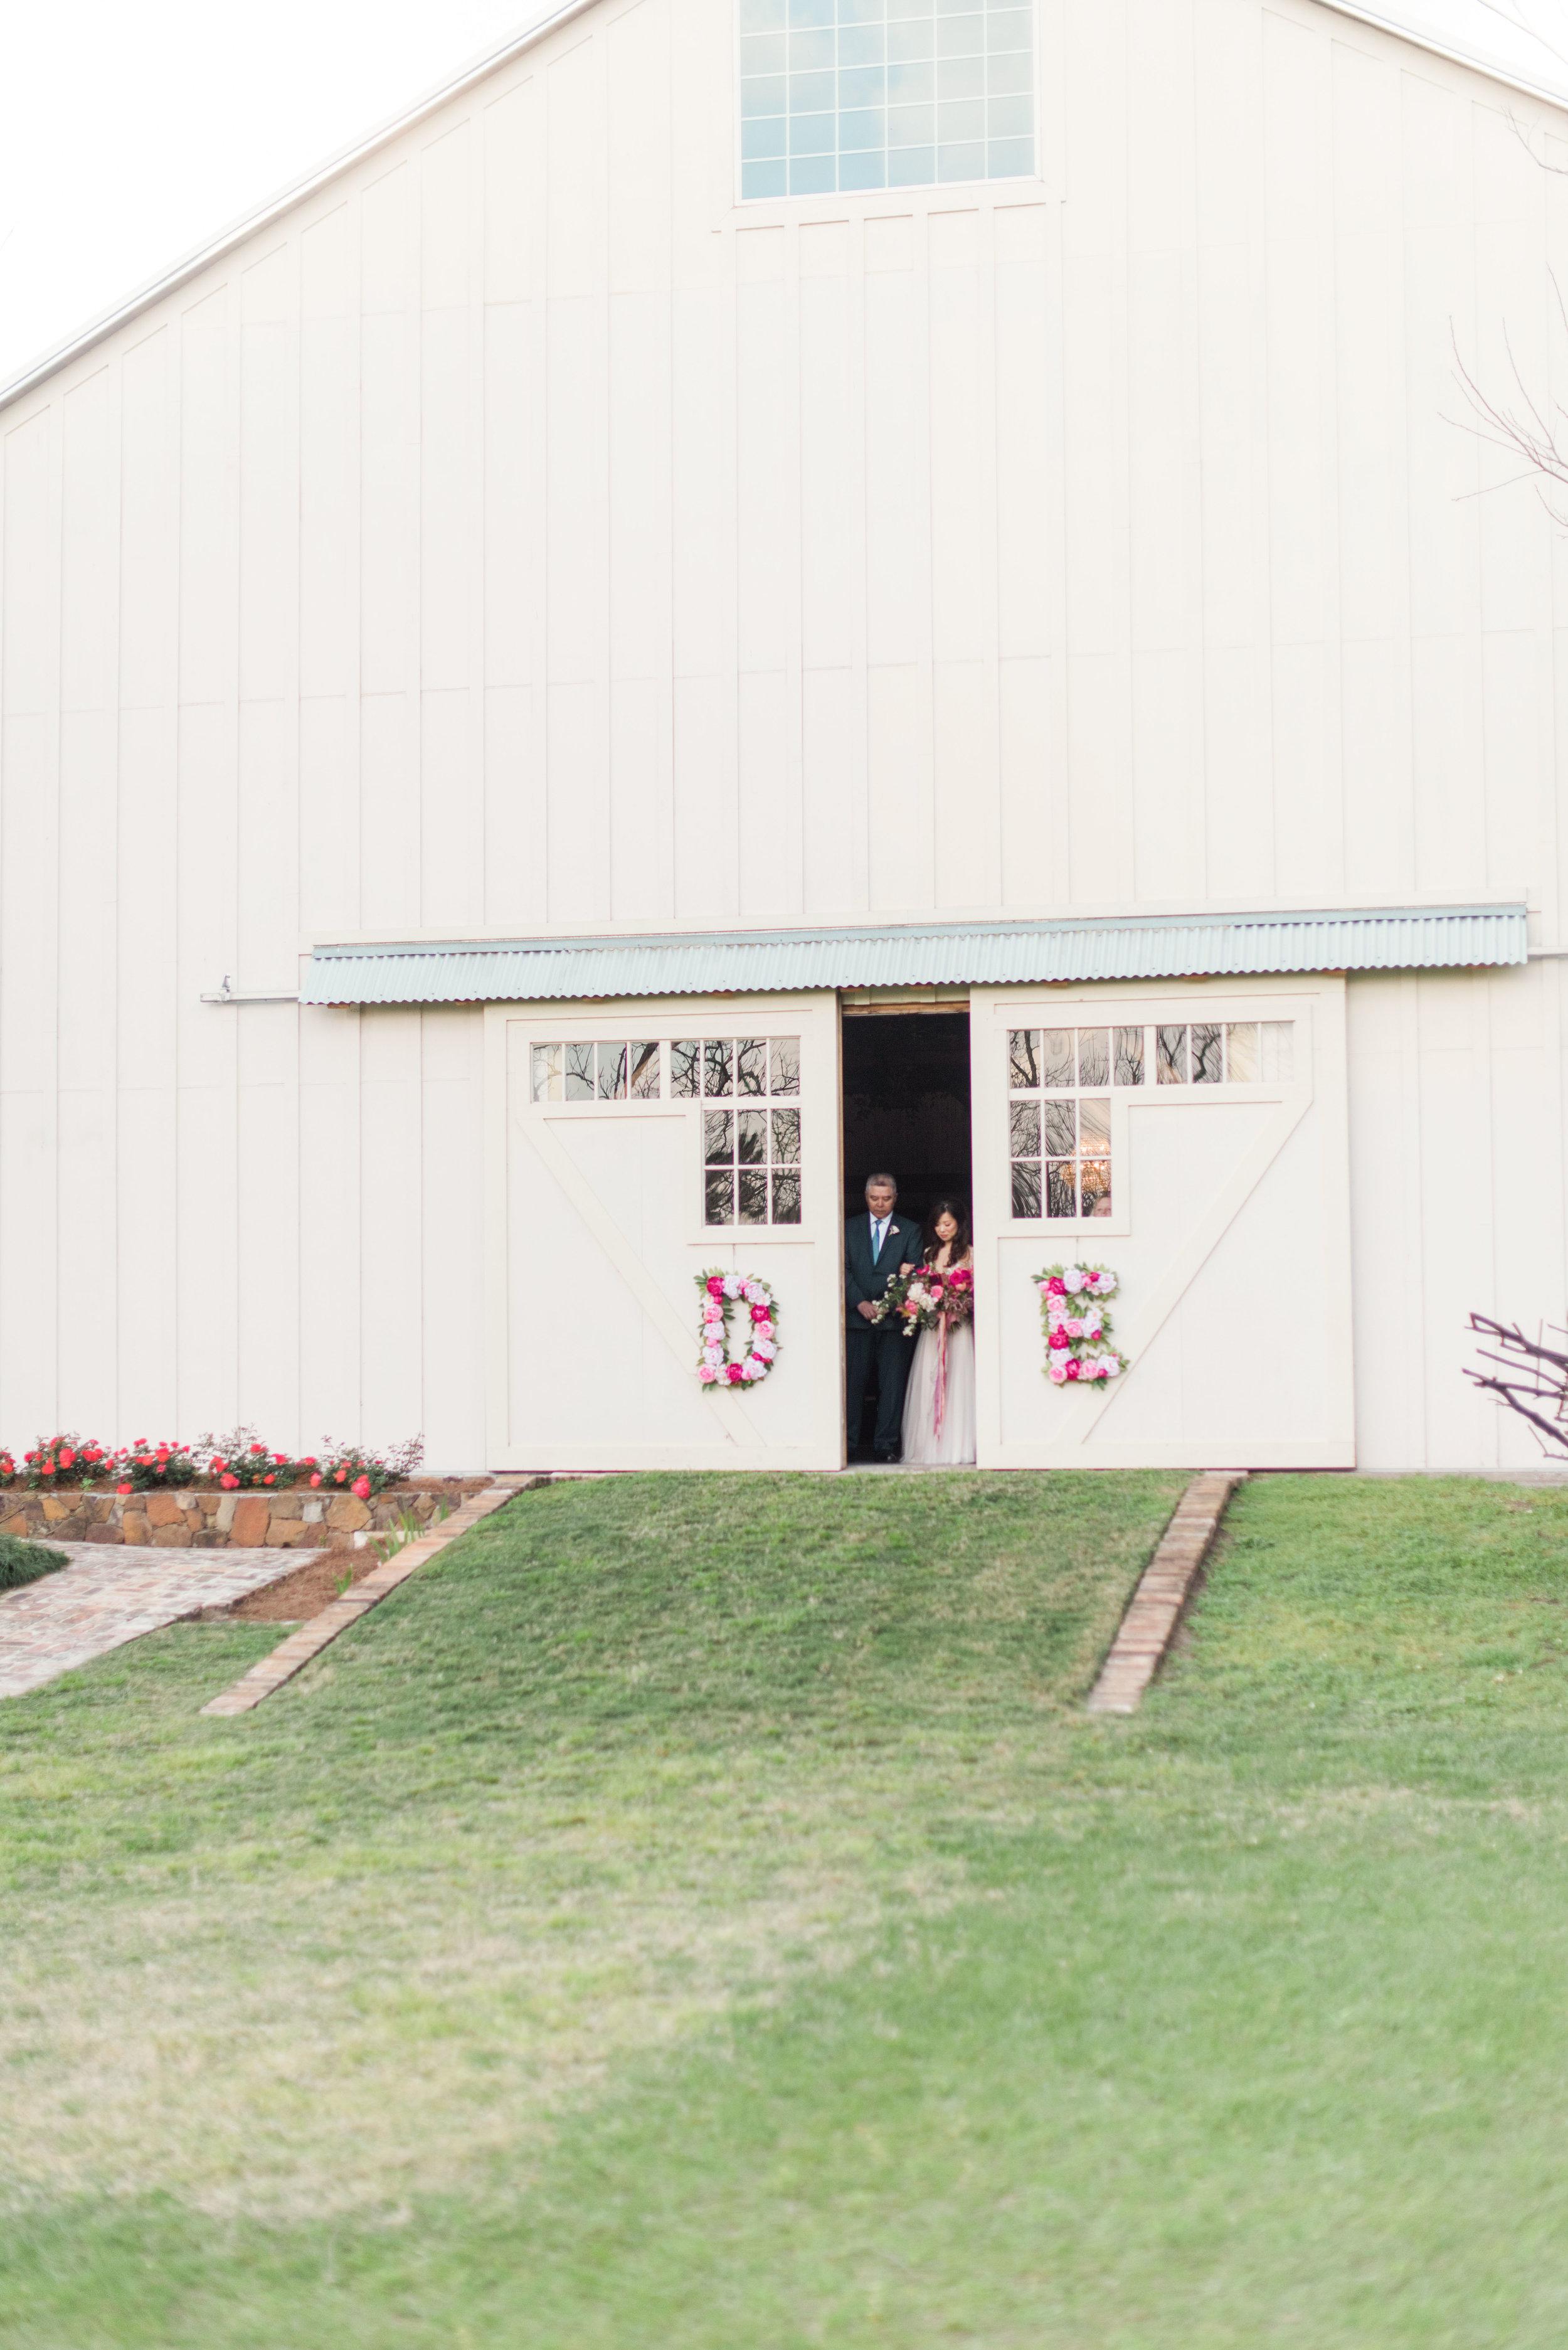 The-Knot-50-Weddings-50-States-Texas-Winner-Dana-Fernandez-photography-houston-wedding-photographer-film-fine-art-destination-27.jpg